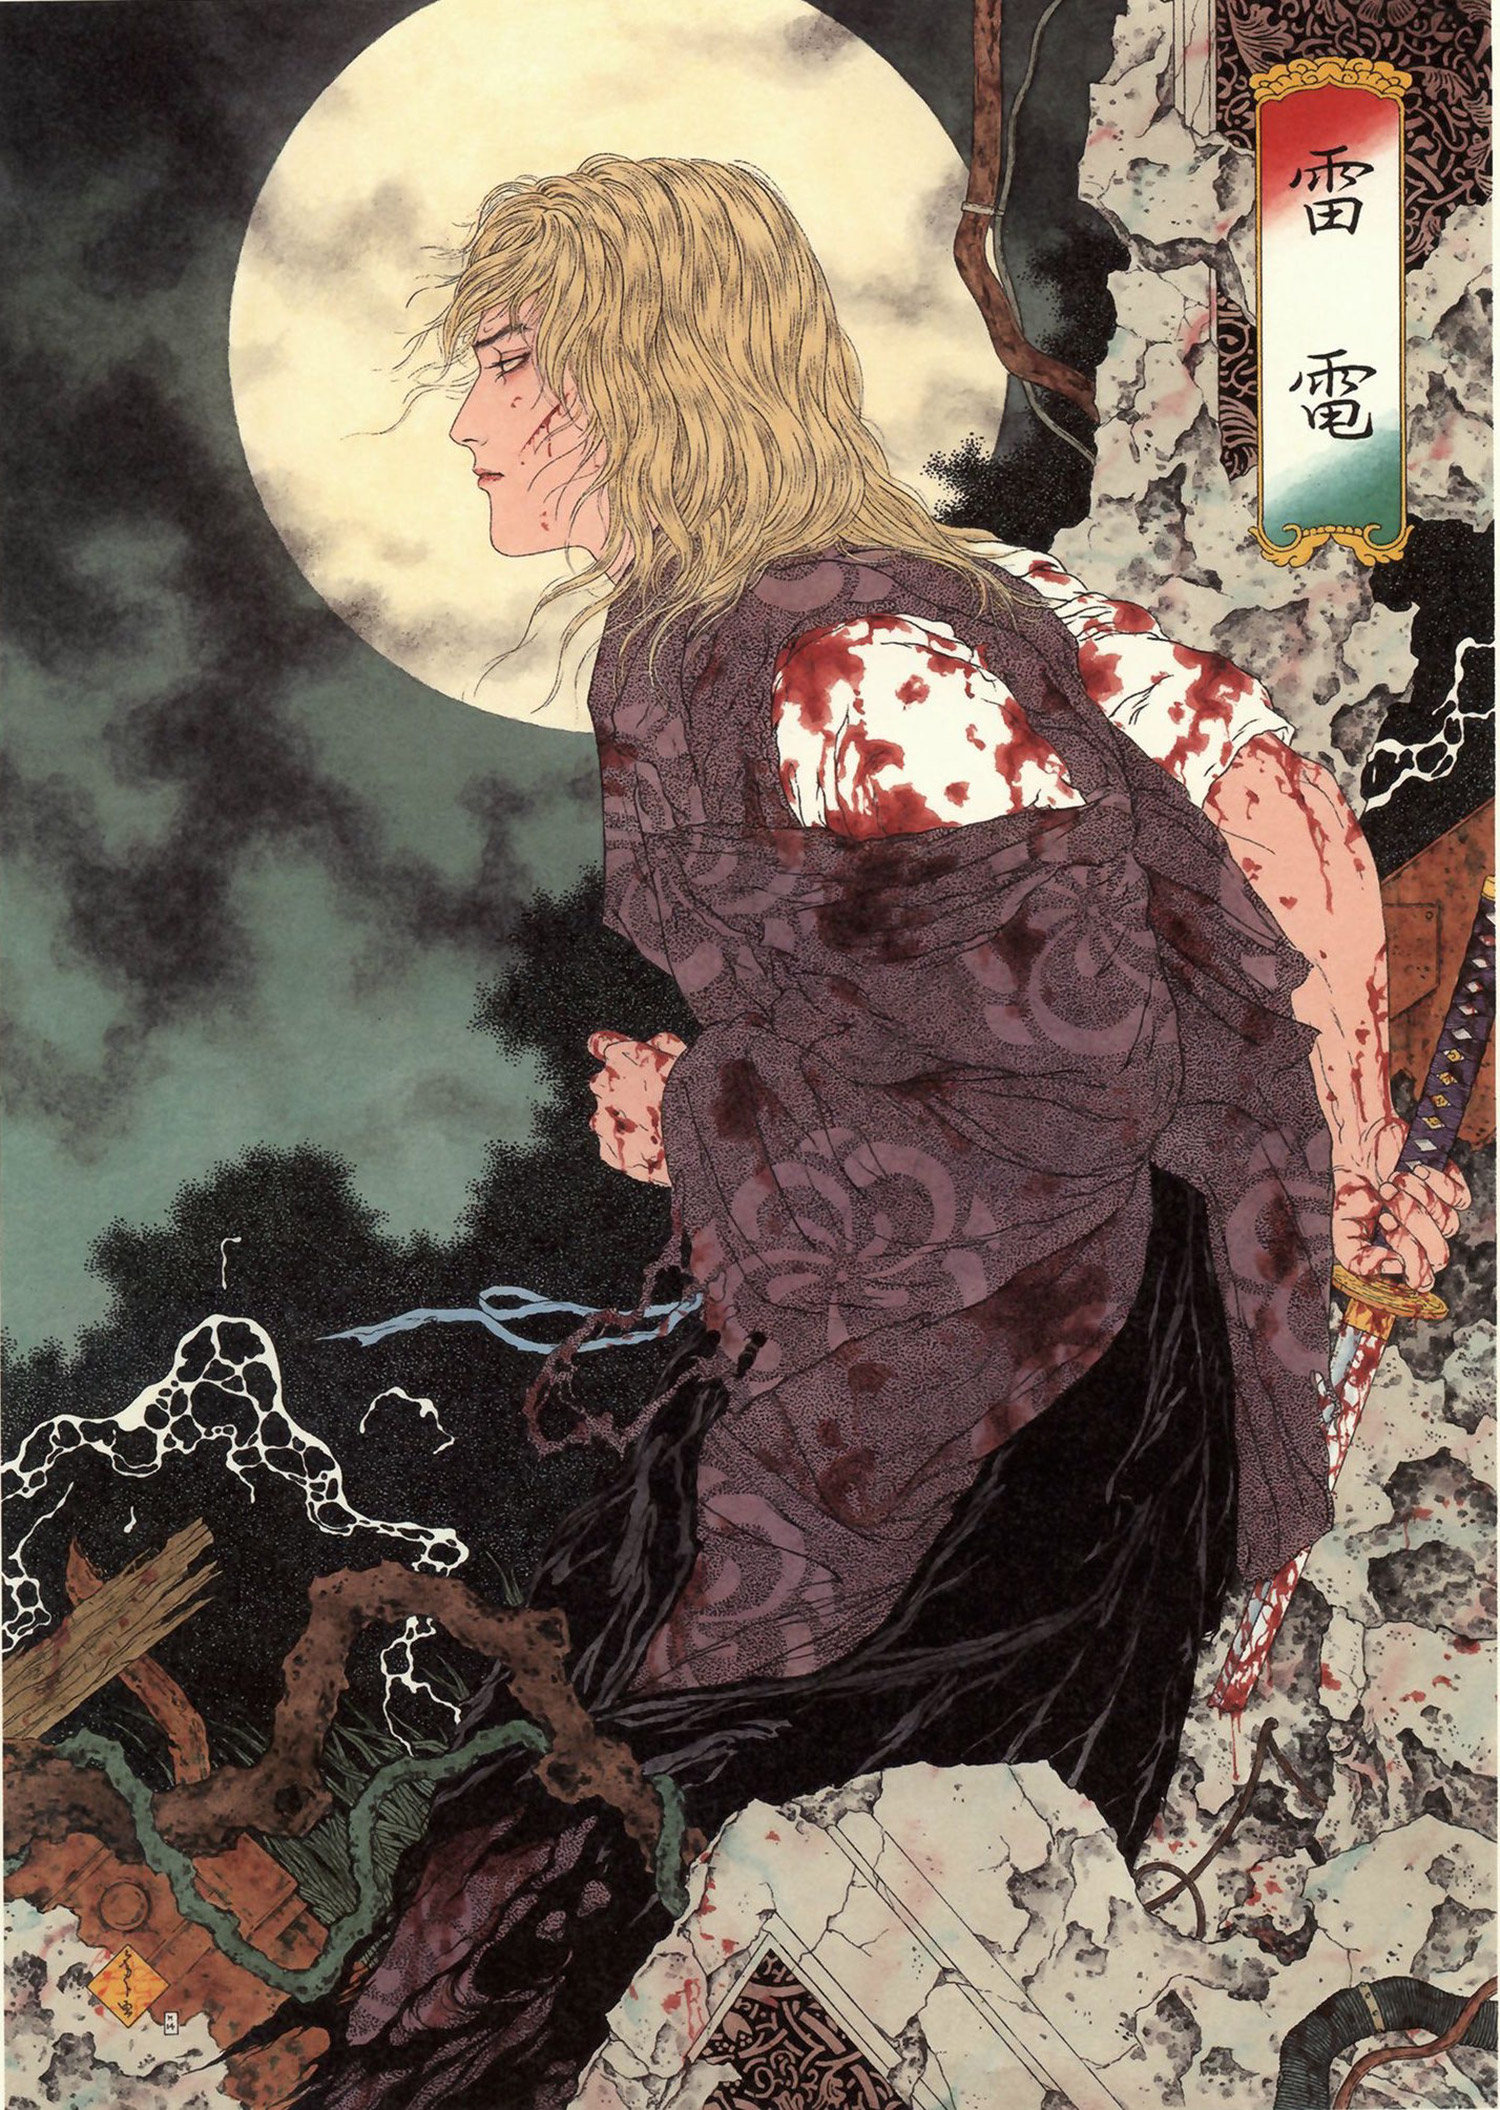 Takato Yamamoto - man with moon